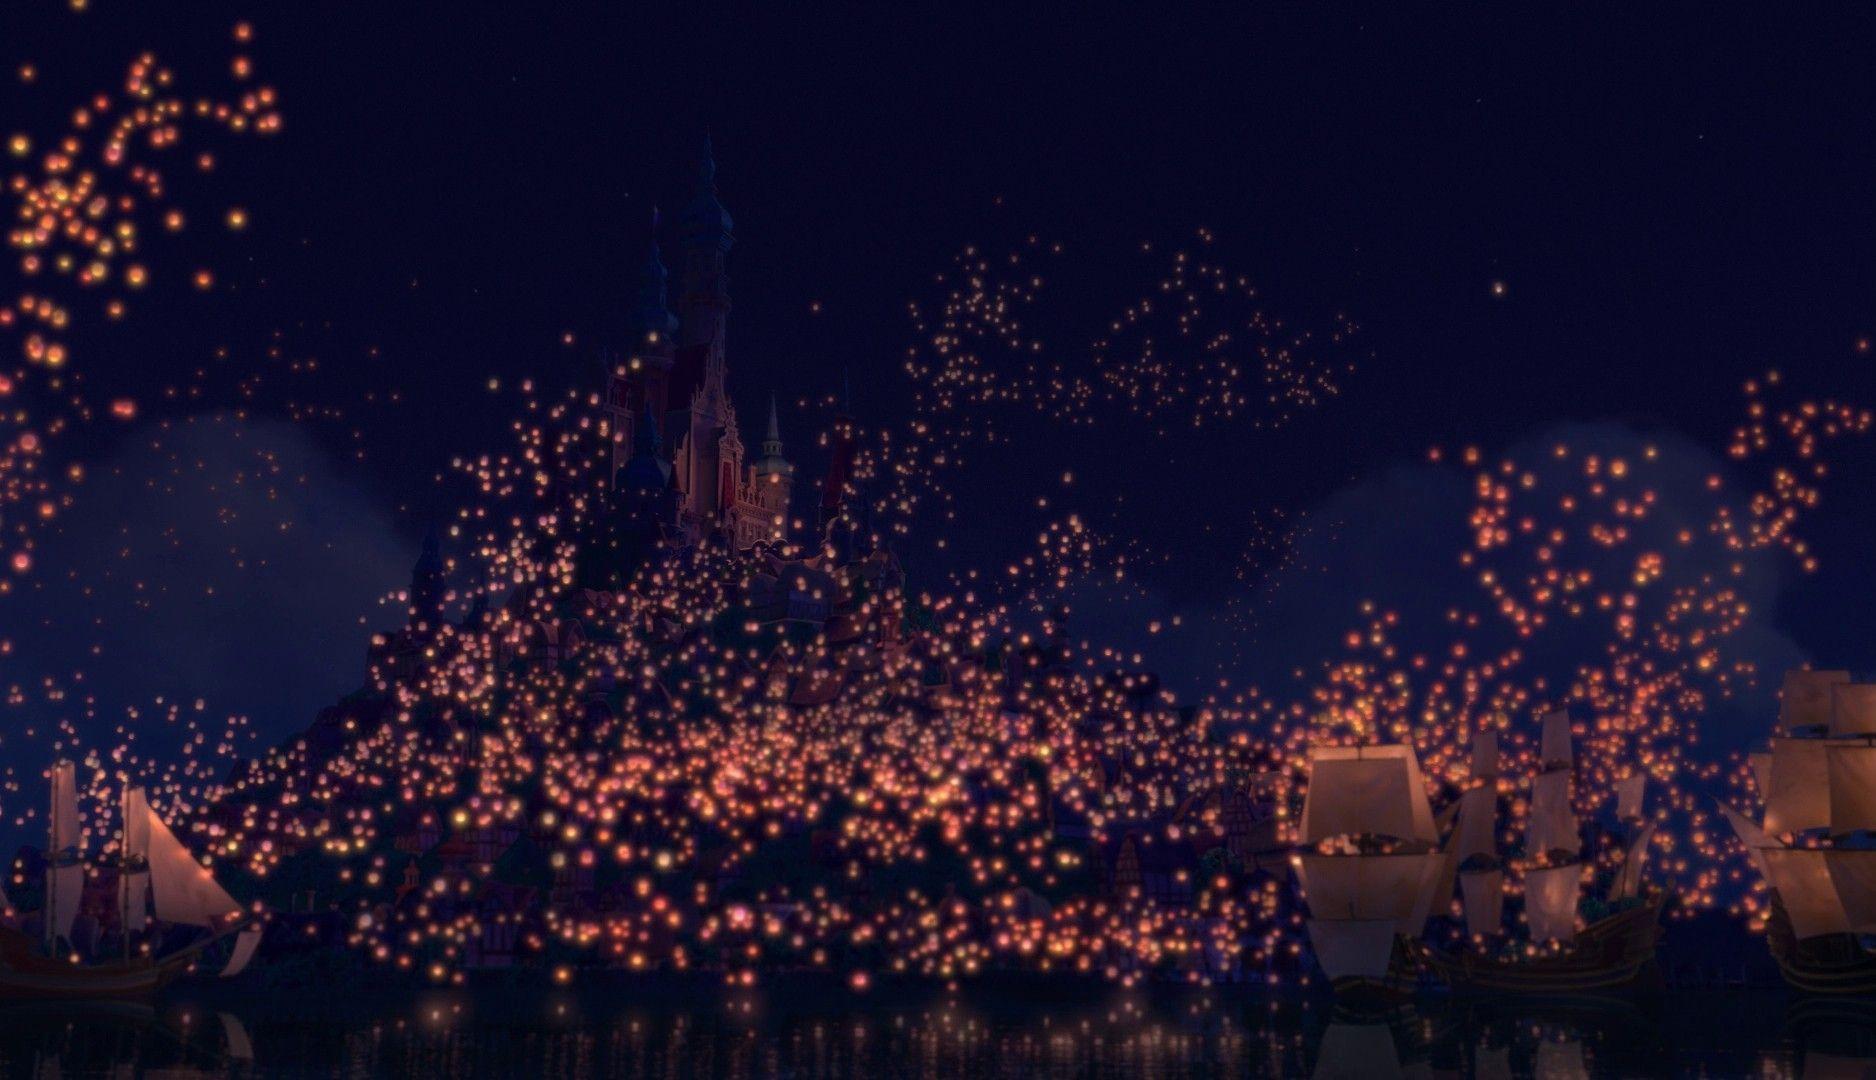 Fantastic Wallpaper Night Lantern - tangled-lanterns-wallpaper-1  Trends-502617.jpg